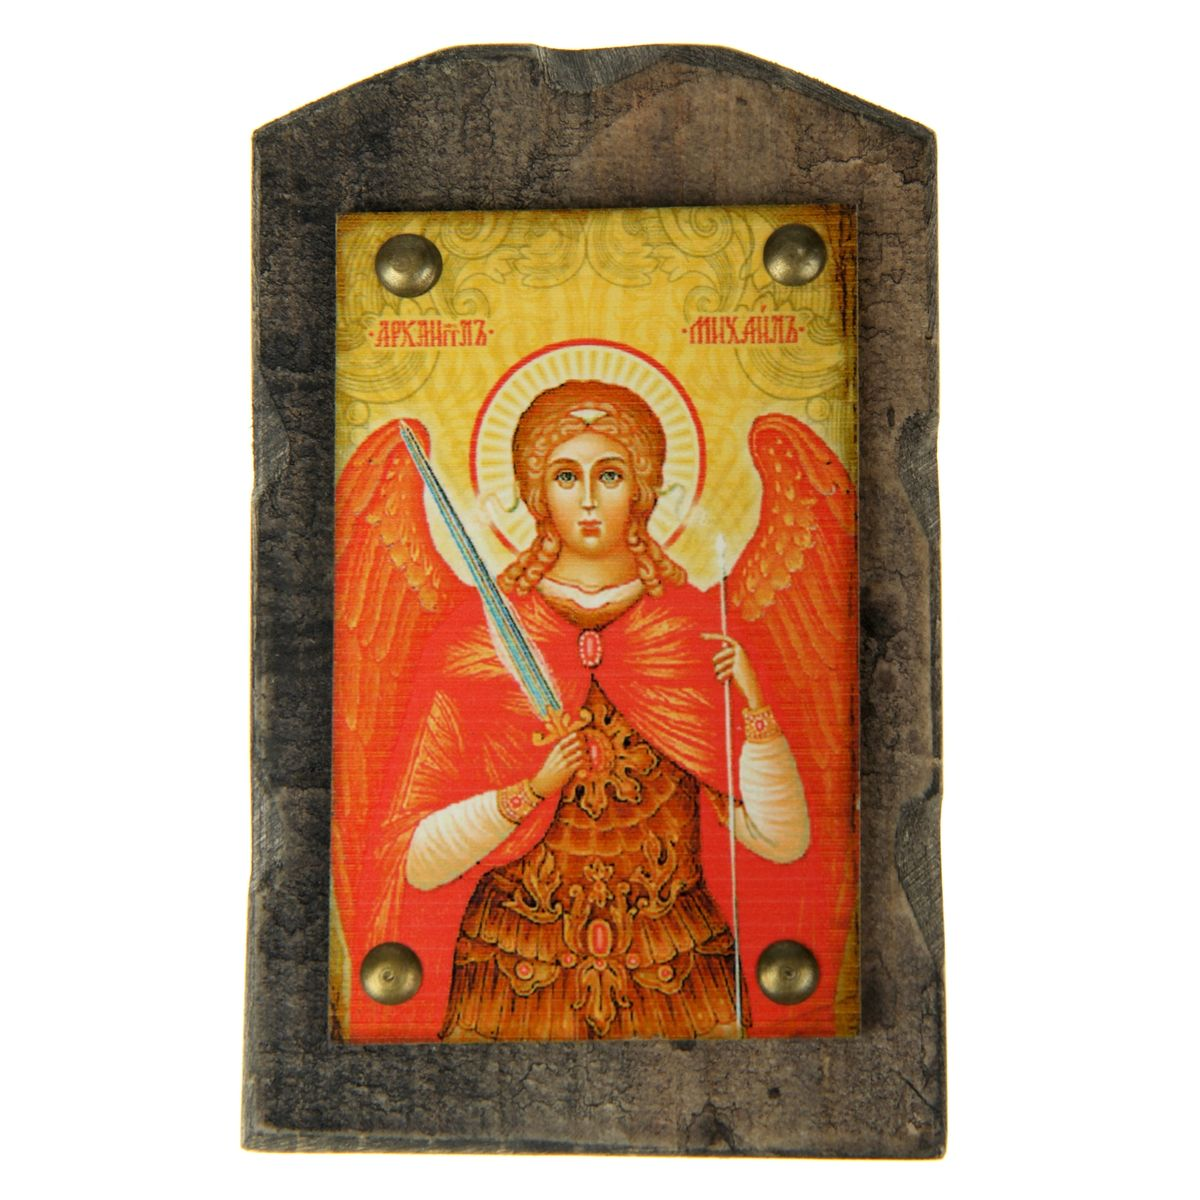 Икона на дереве Архангел Михаил, 9,5 см х 15 см икона янтарная богородица скоропослушница кян 2 305